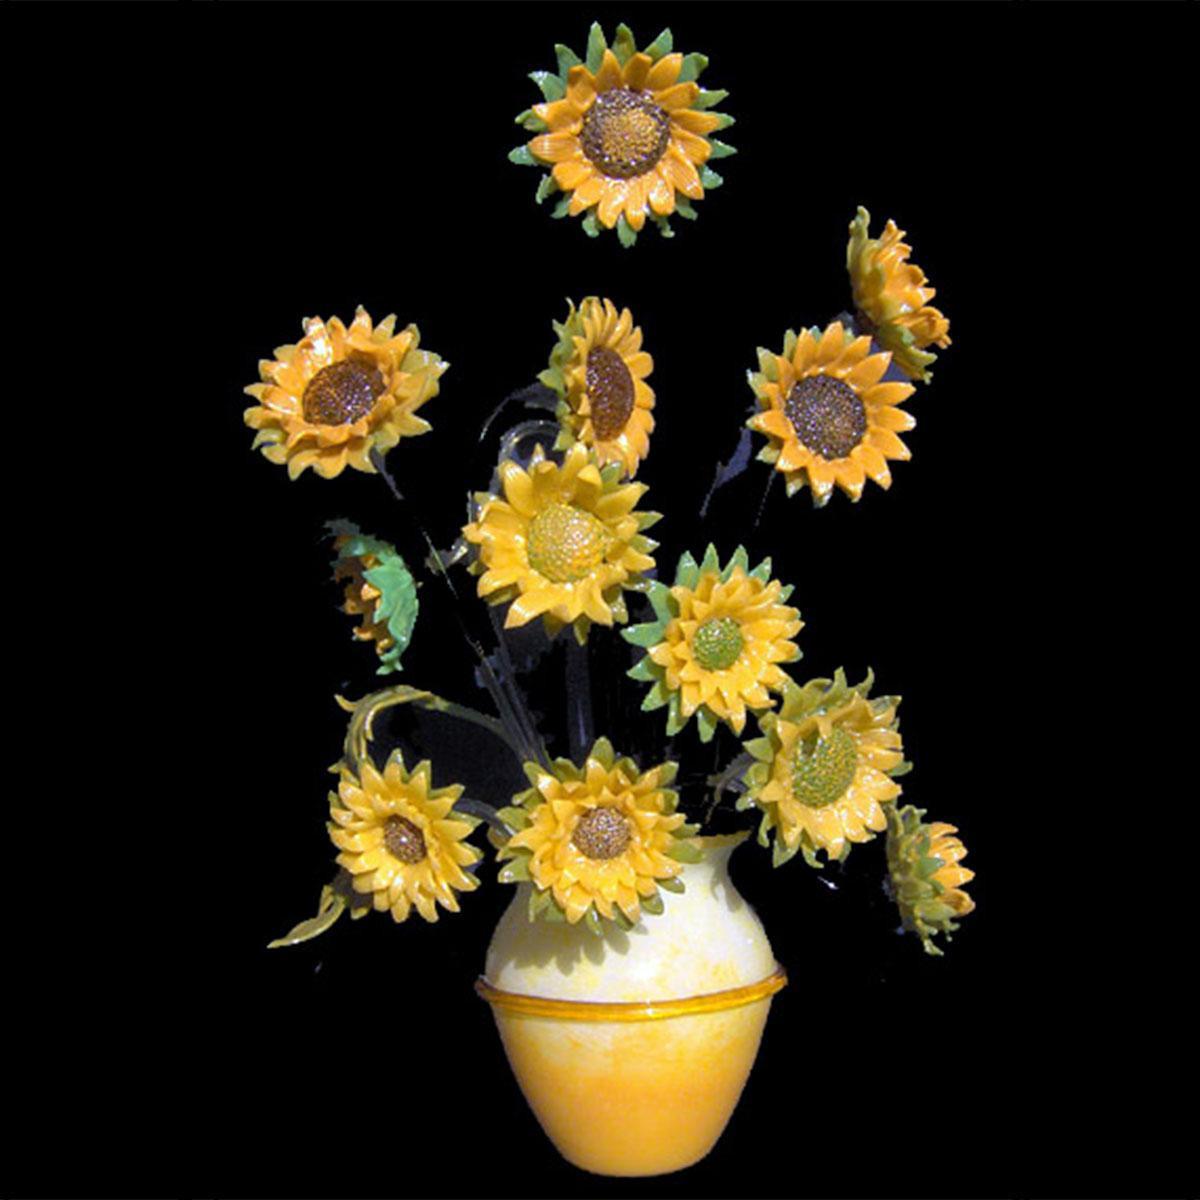 """Girasoli"" lampe de table en verre de Murano - tournesol"